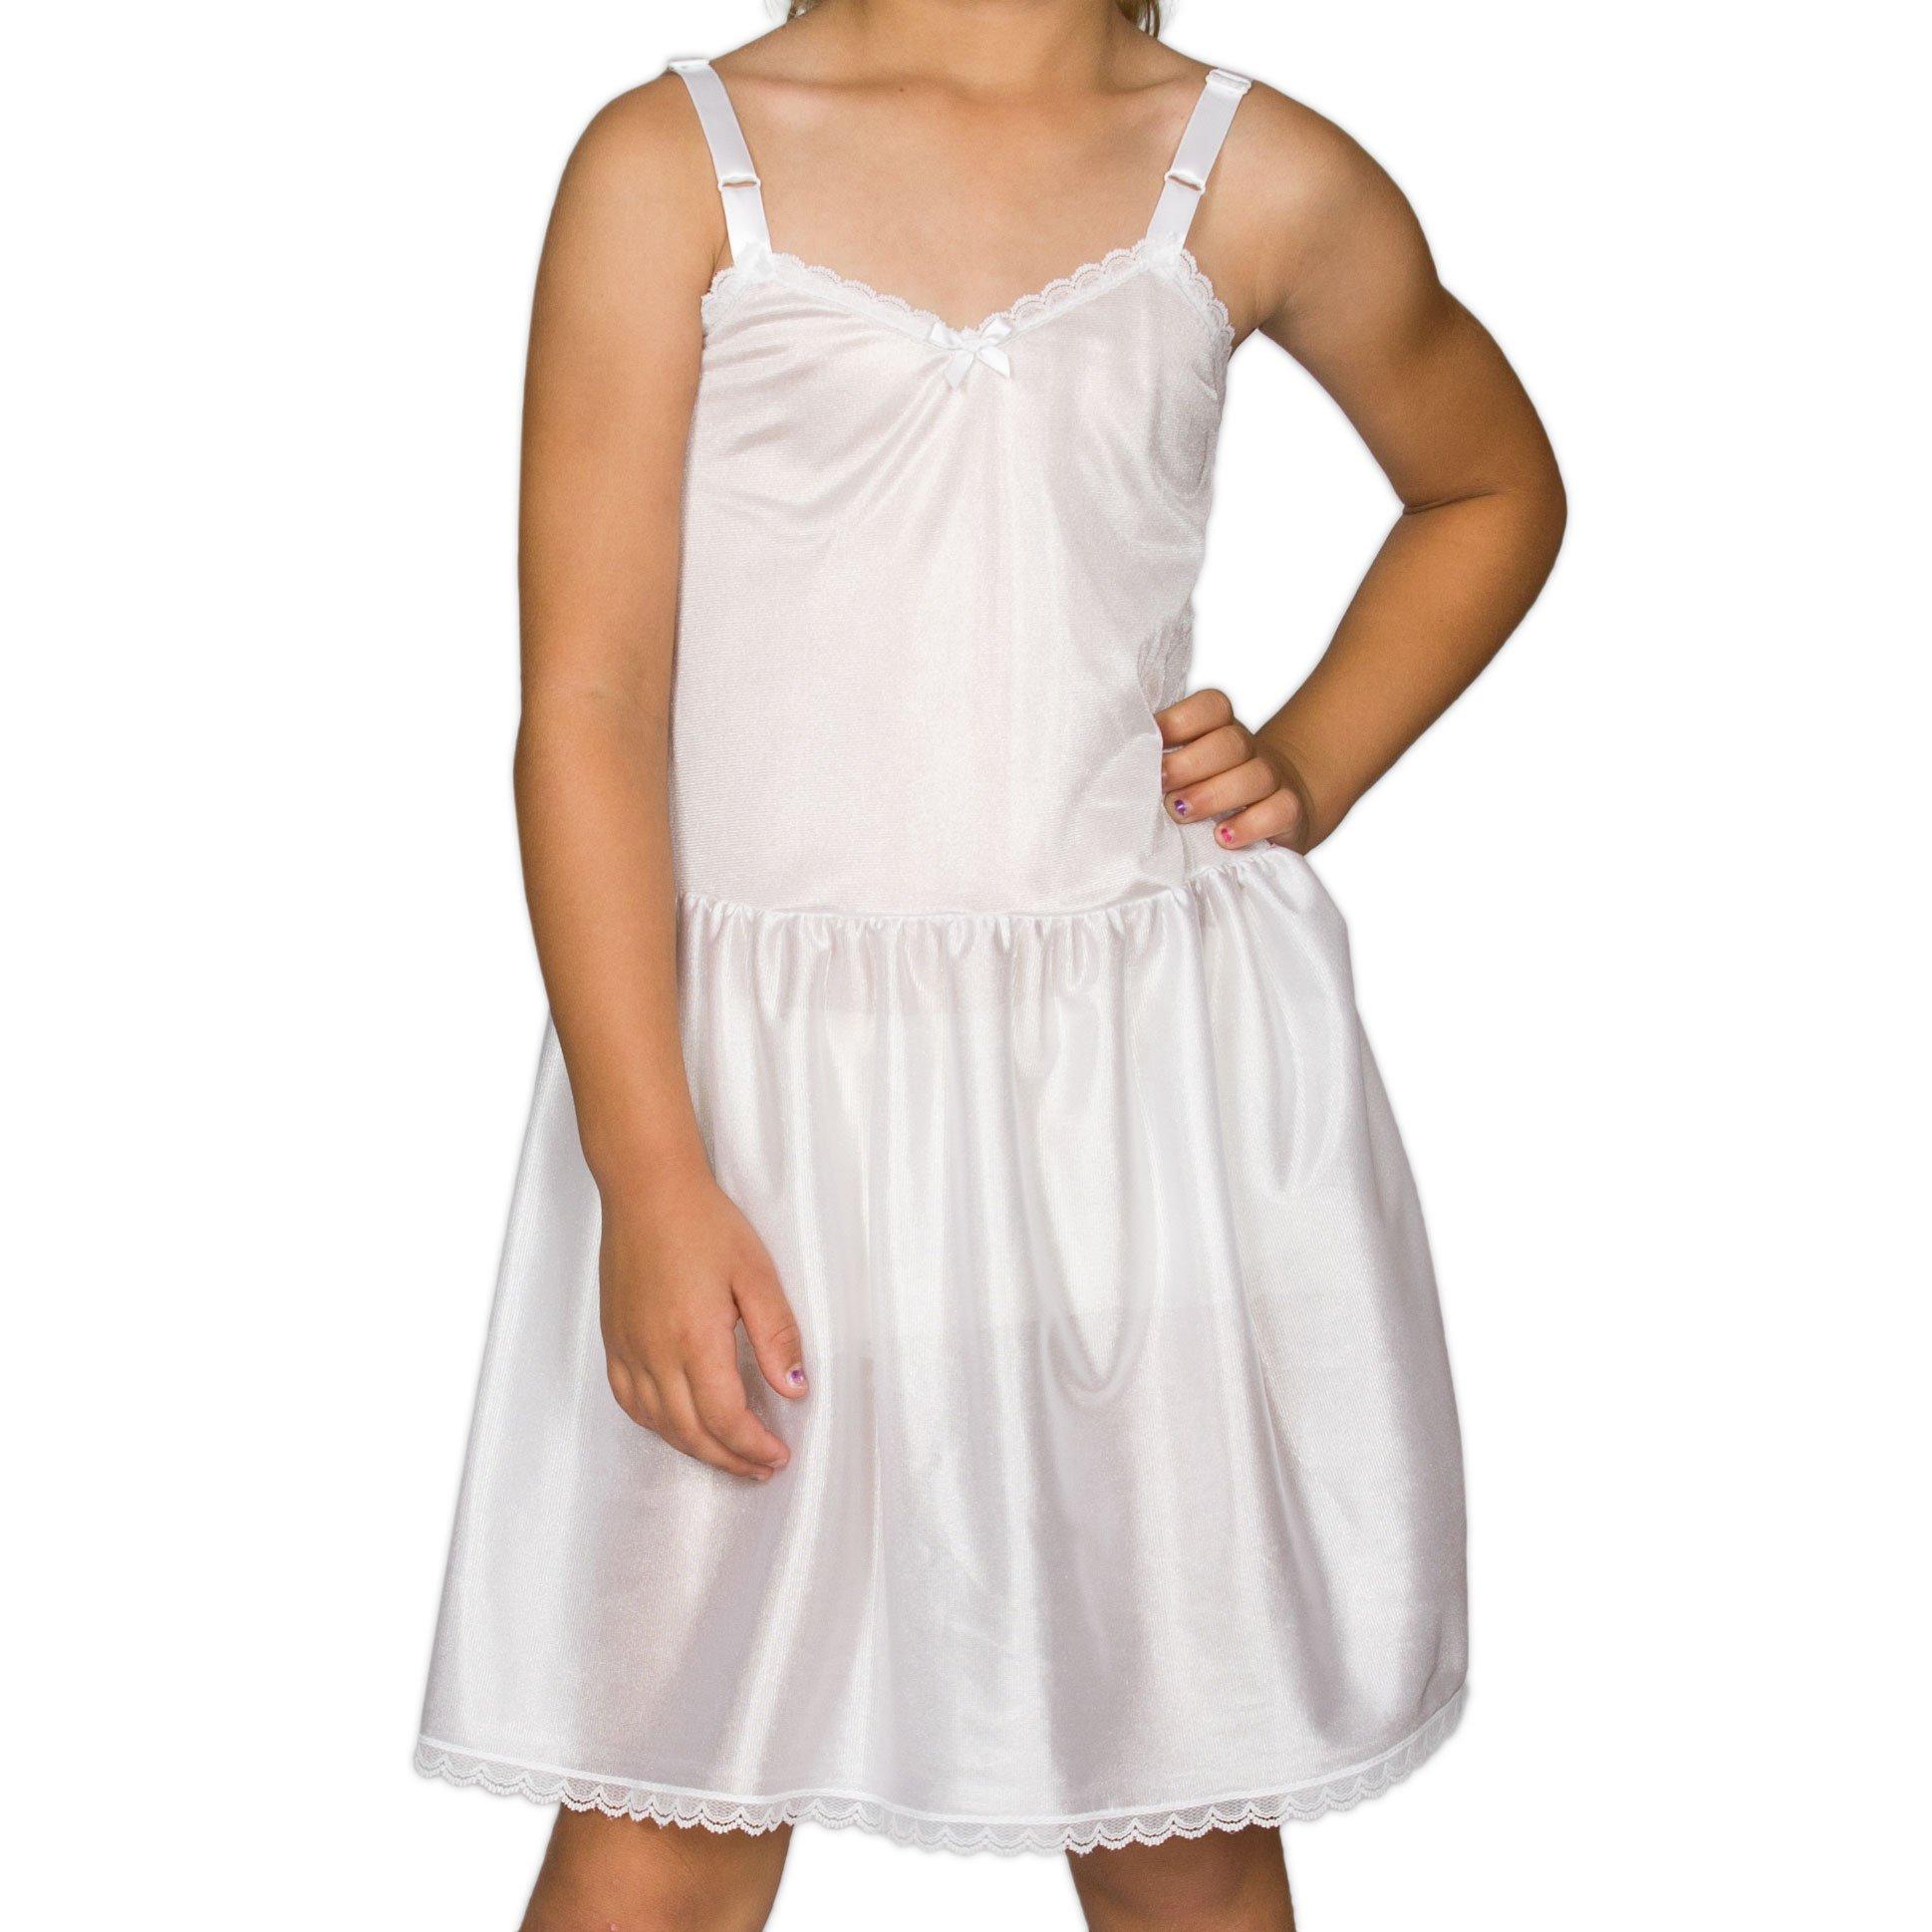 I.C. Collections Big Girls White Adjustable Nylon Slip, 14